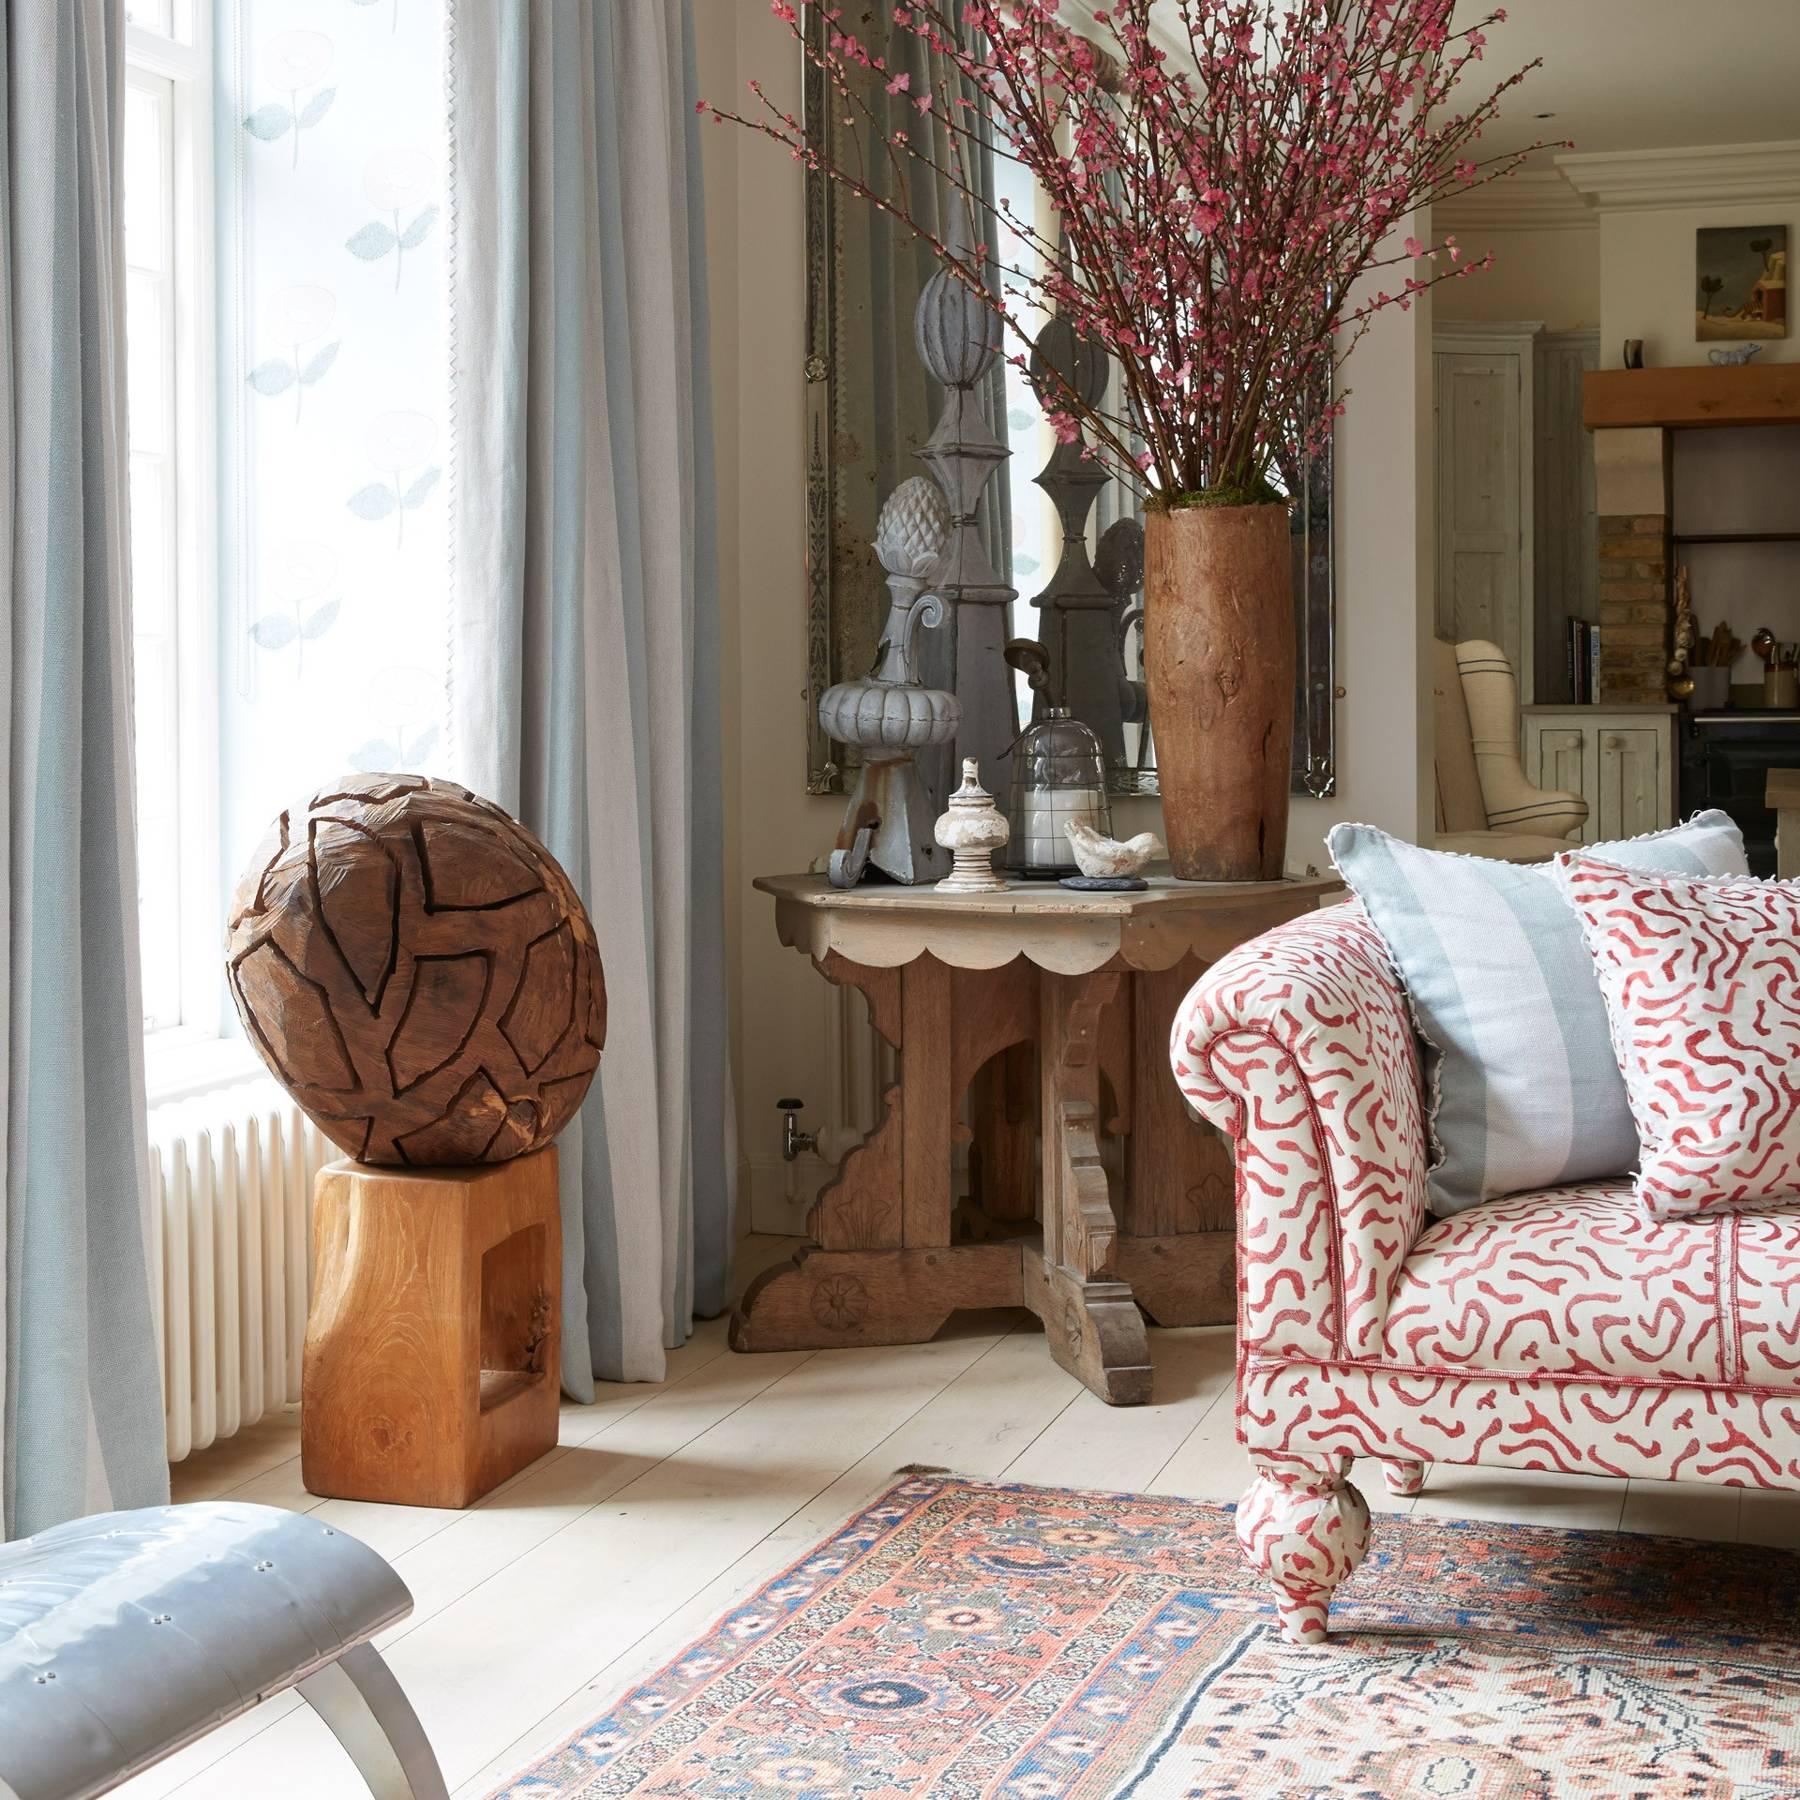 Kit Kemp Style File | Anthropologie | Interior Design Ideas | House & Garden